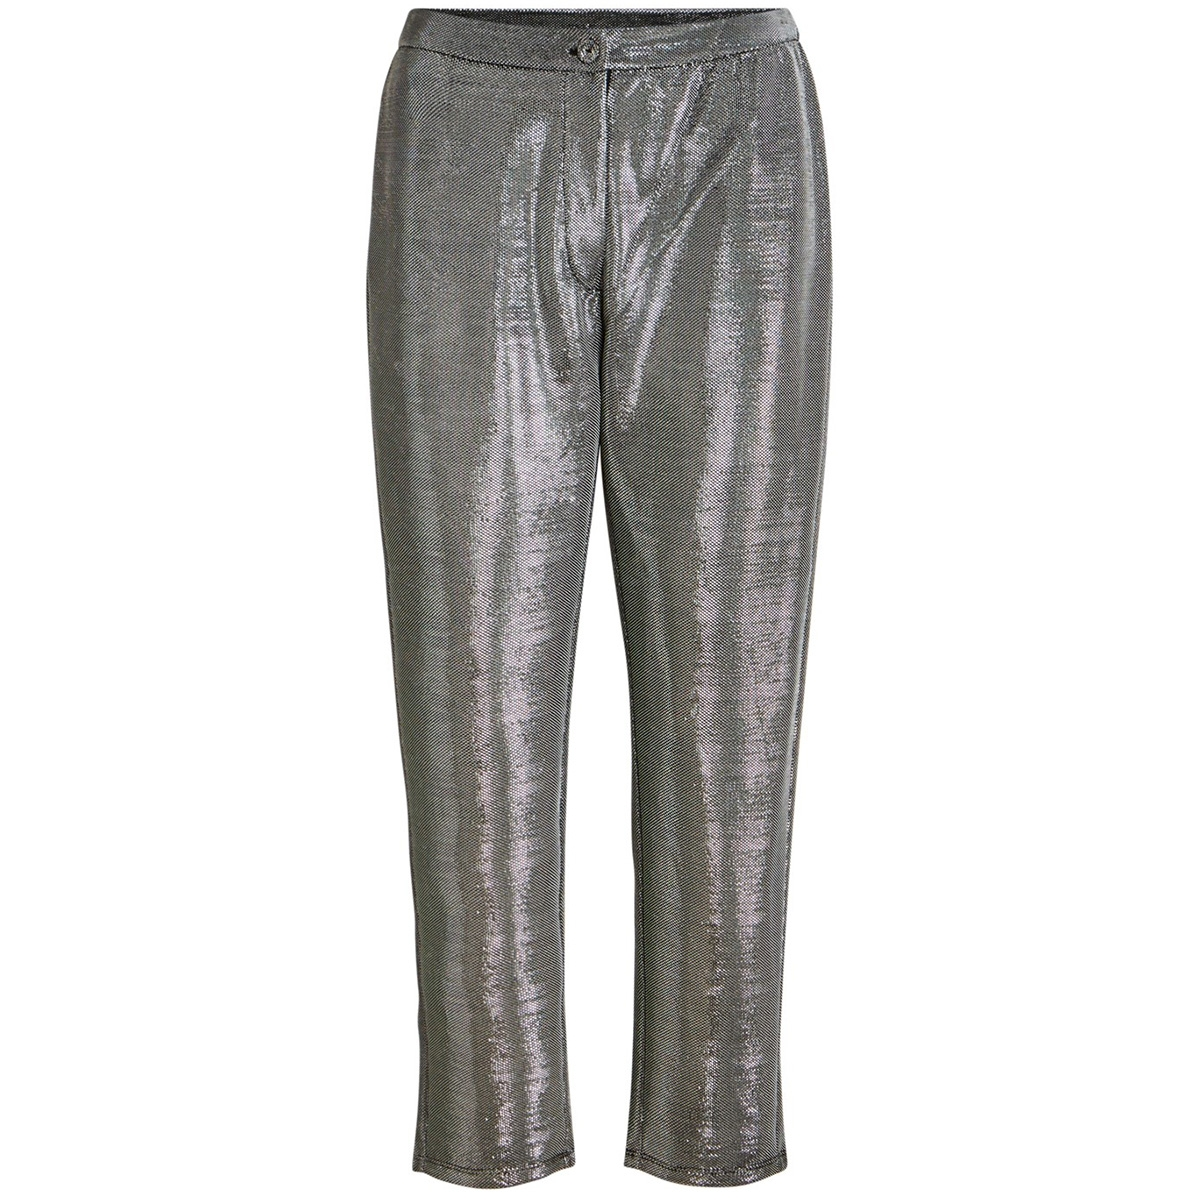 vifadora rwre 7/8 pant 14056633 vila broek silver